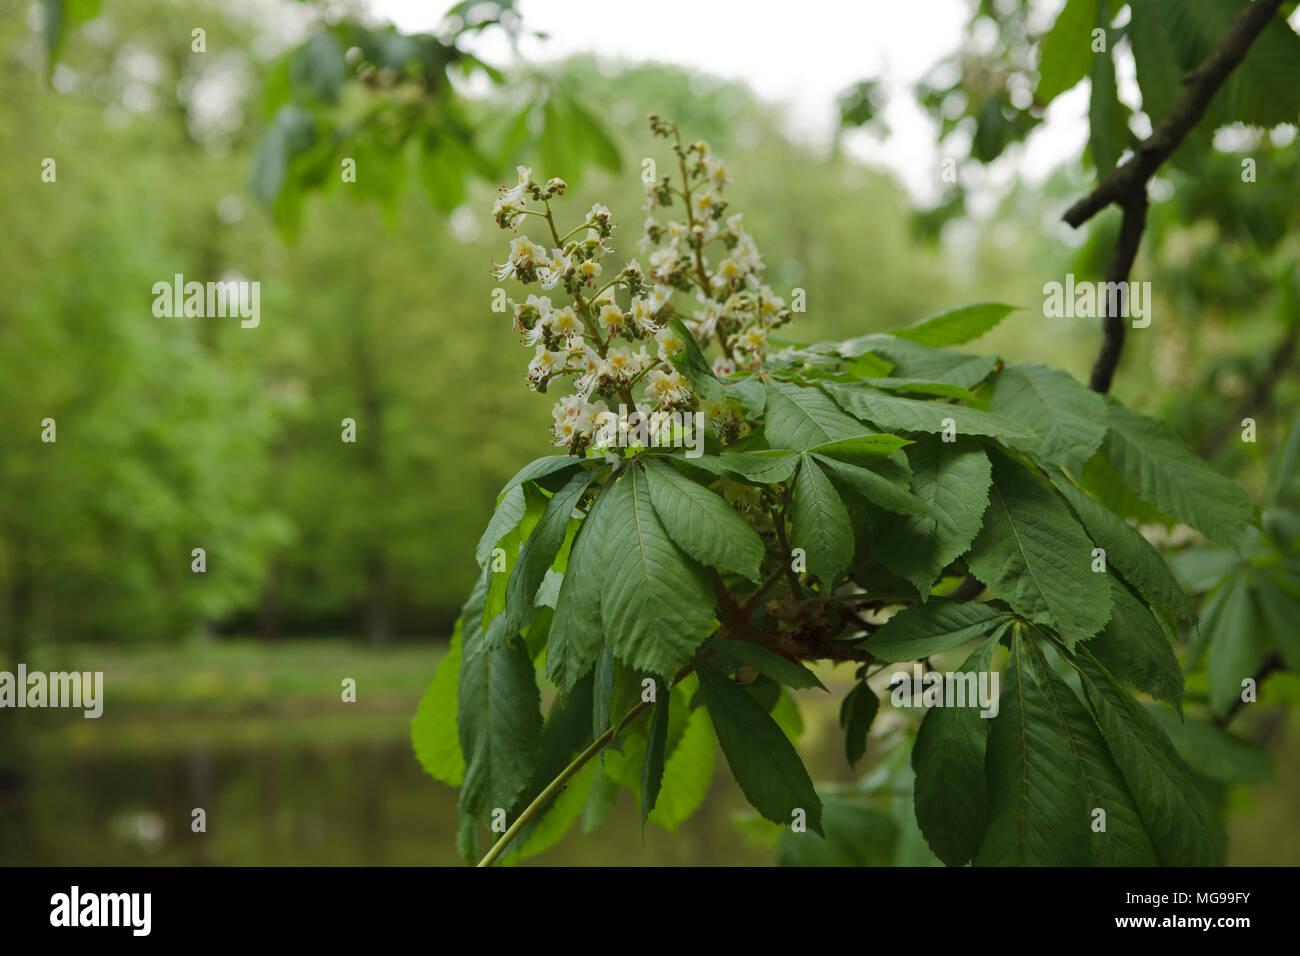 chestnut flowers close up - Stock Image